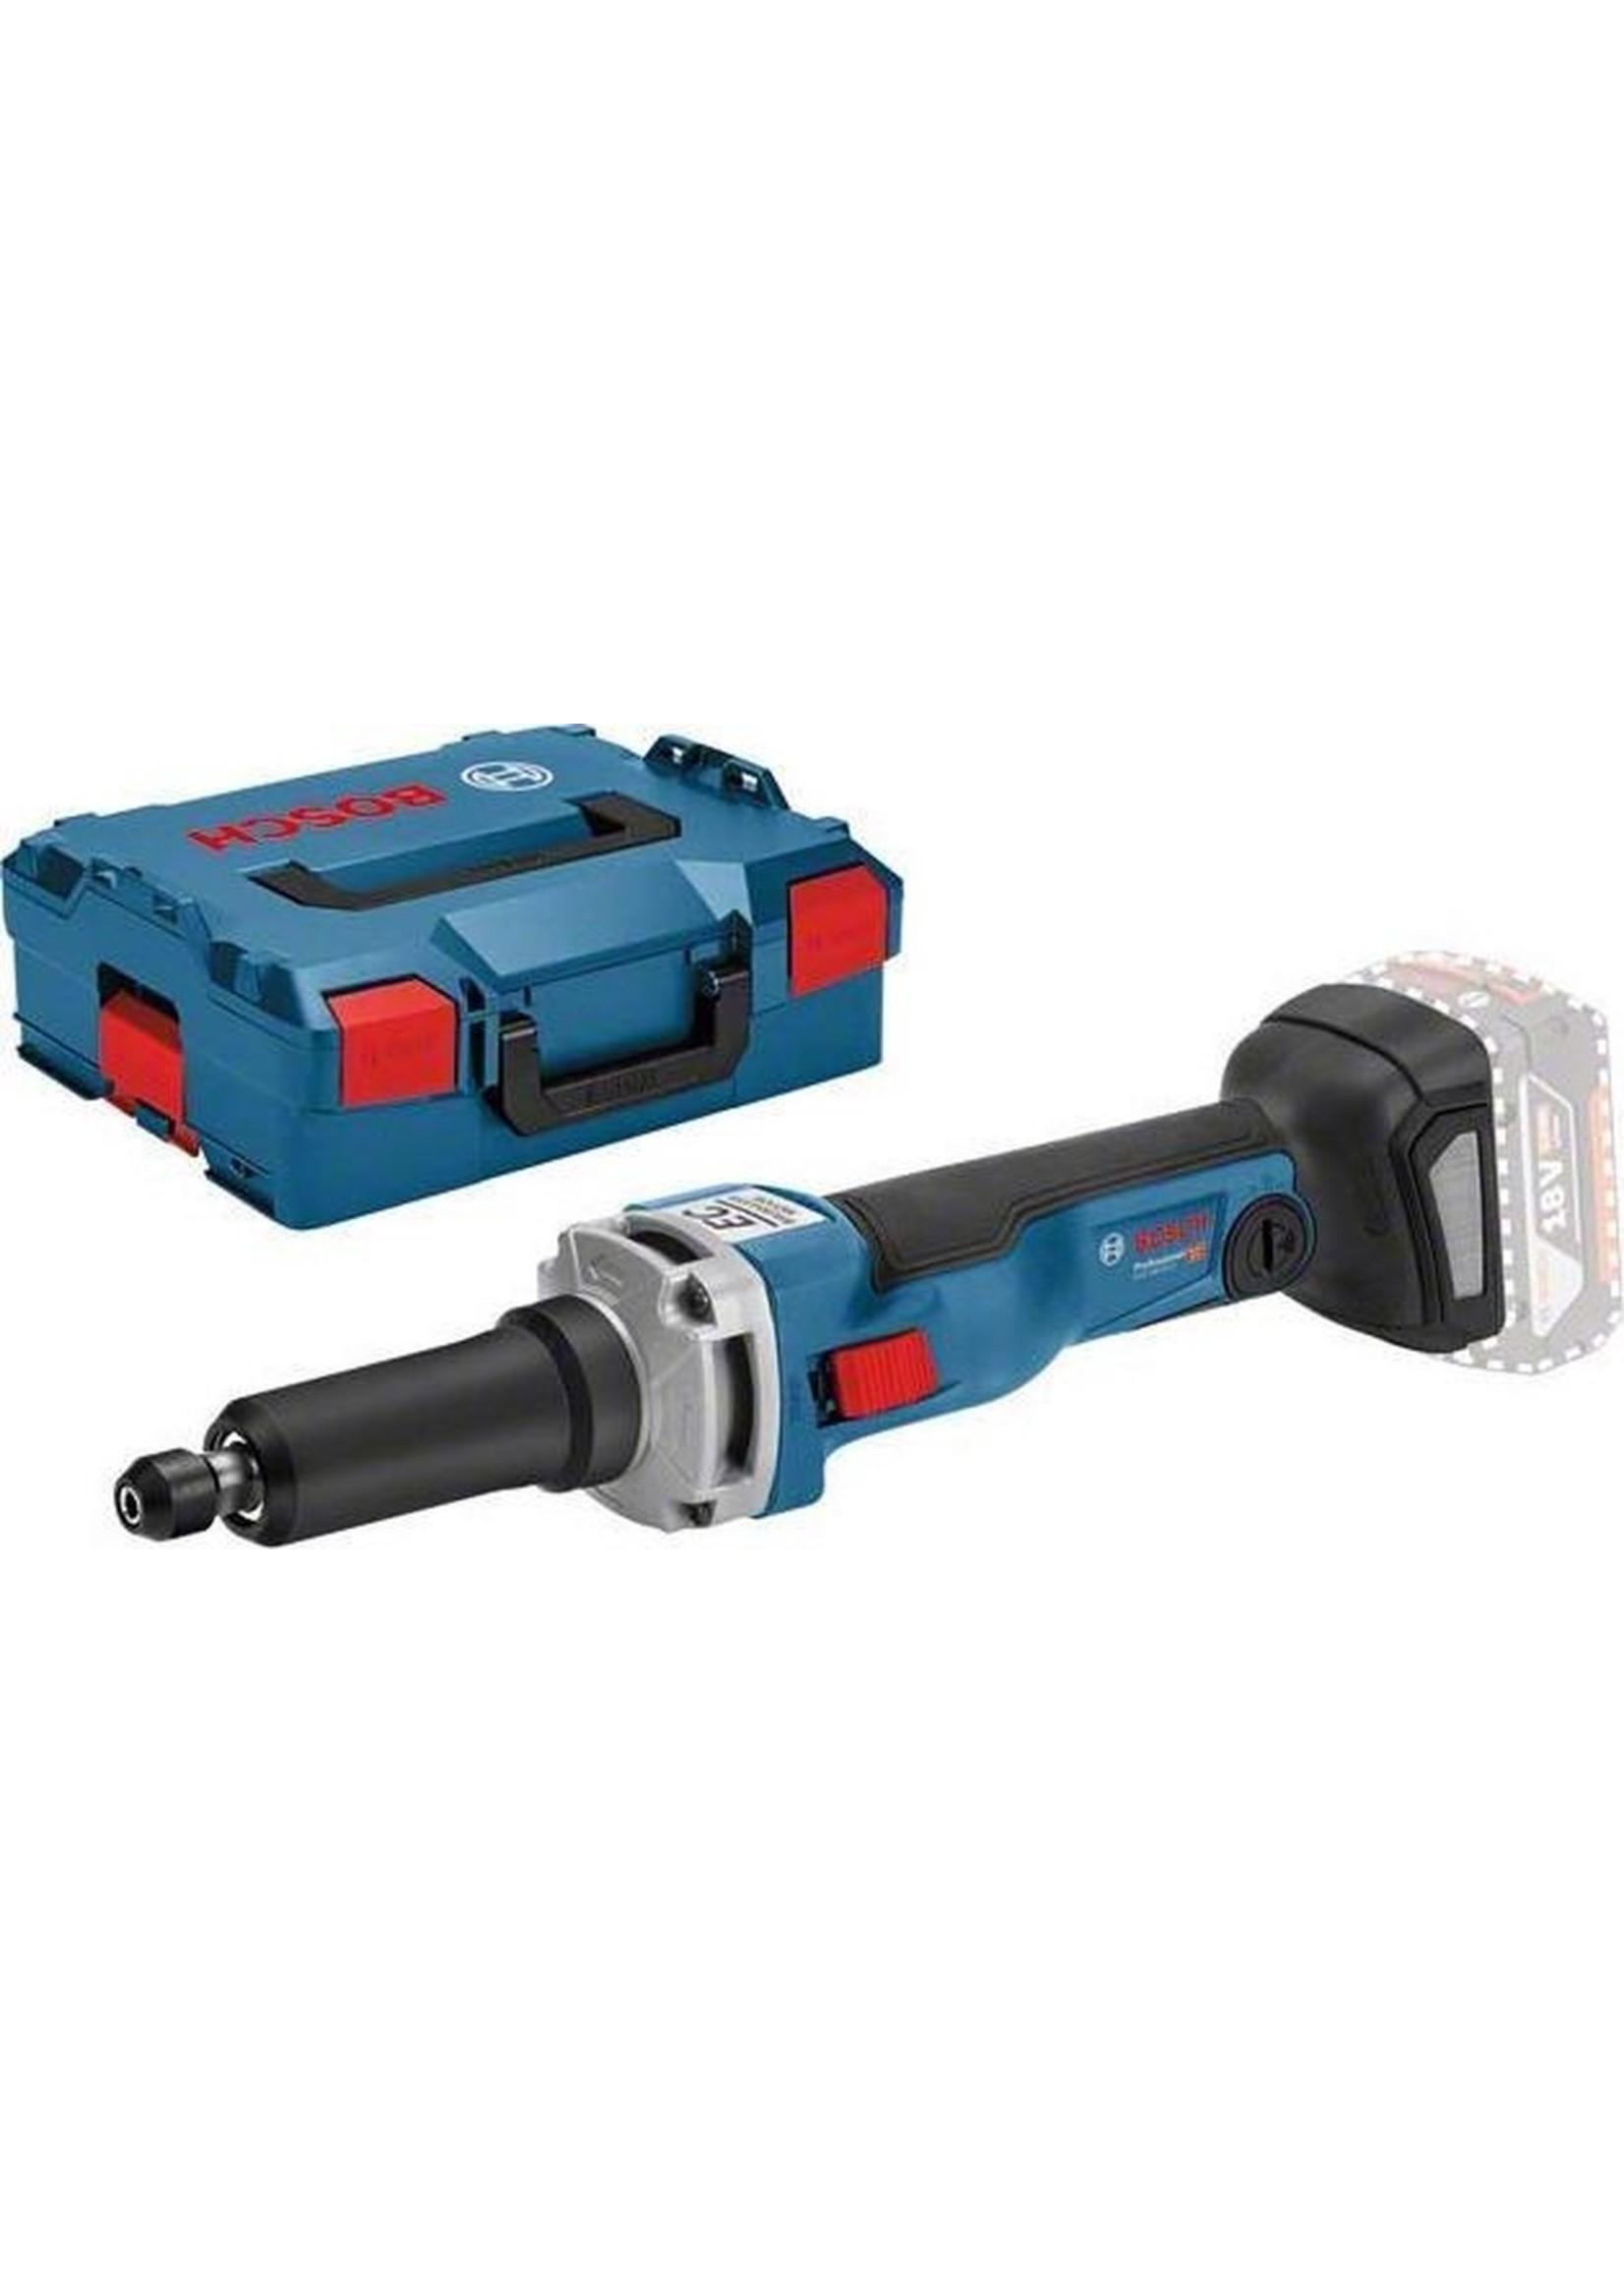 Bosch BOSCH  GGS 18V-23 LC Rechte slijpmachine Solo | zonder accu's en lader | In L-Boxx koopjeshoek